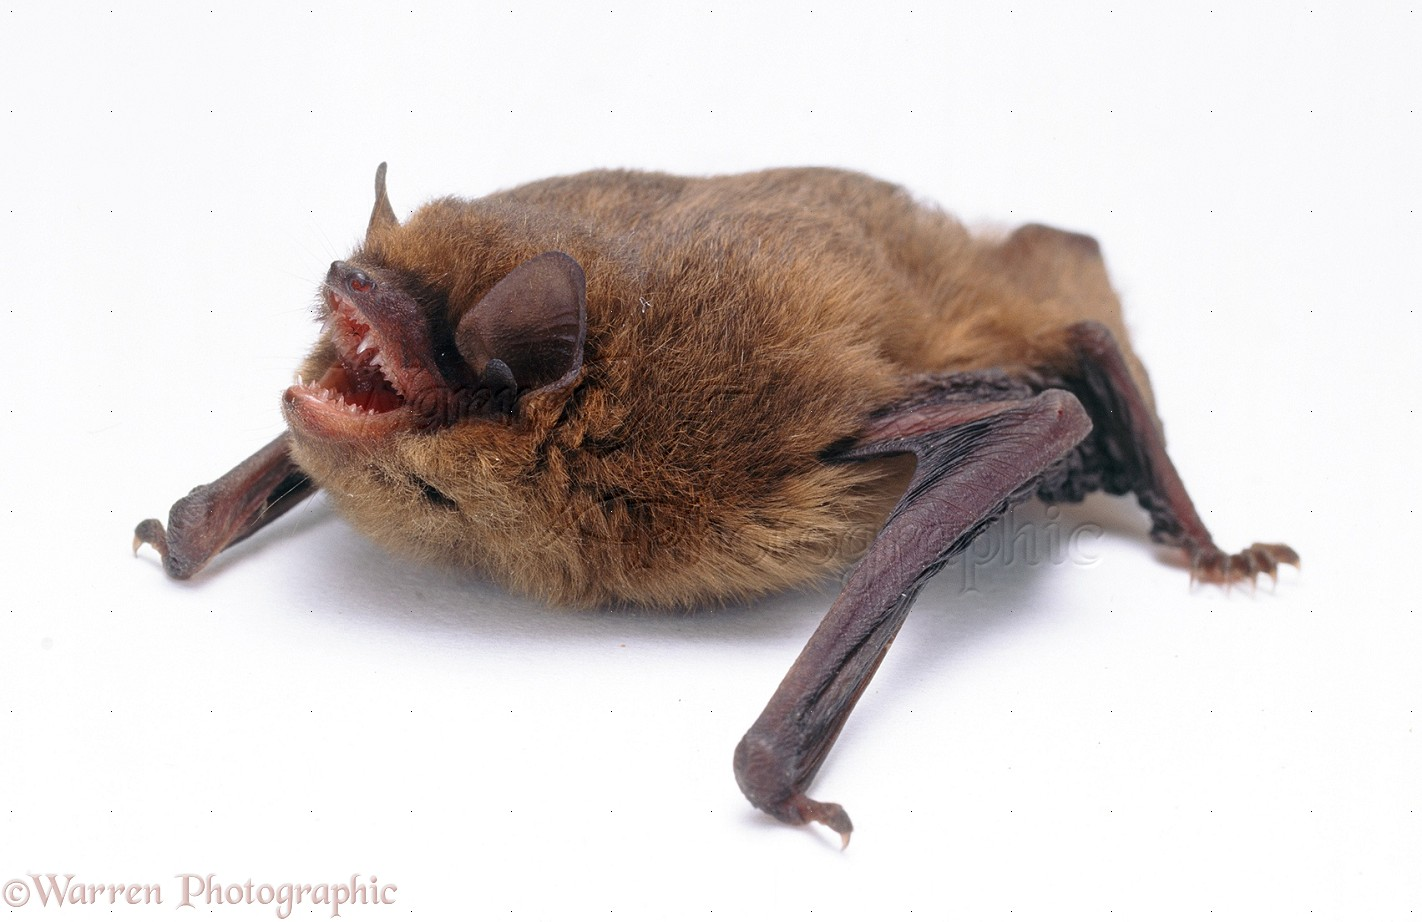 pipistrelle bat photo wp19518